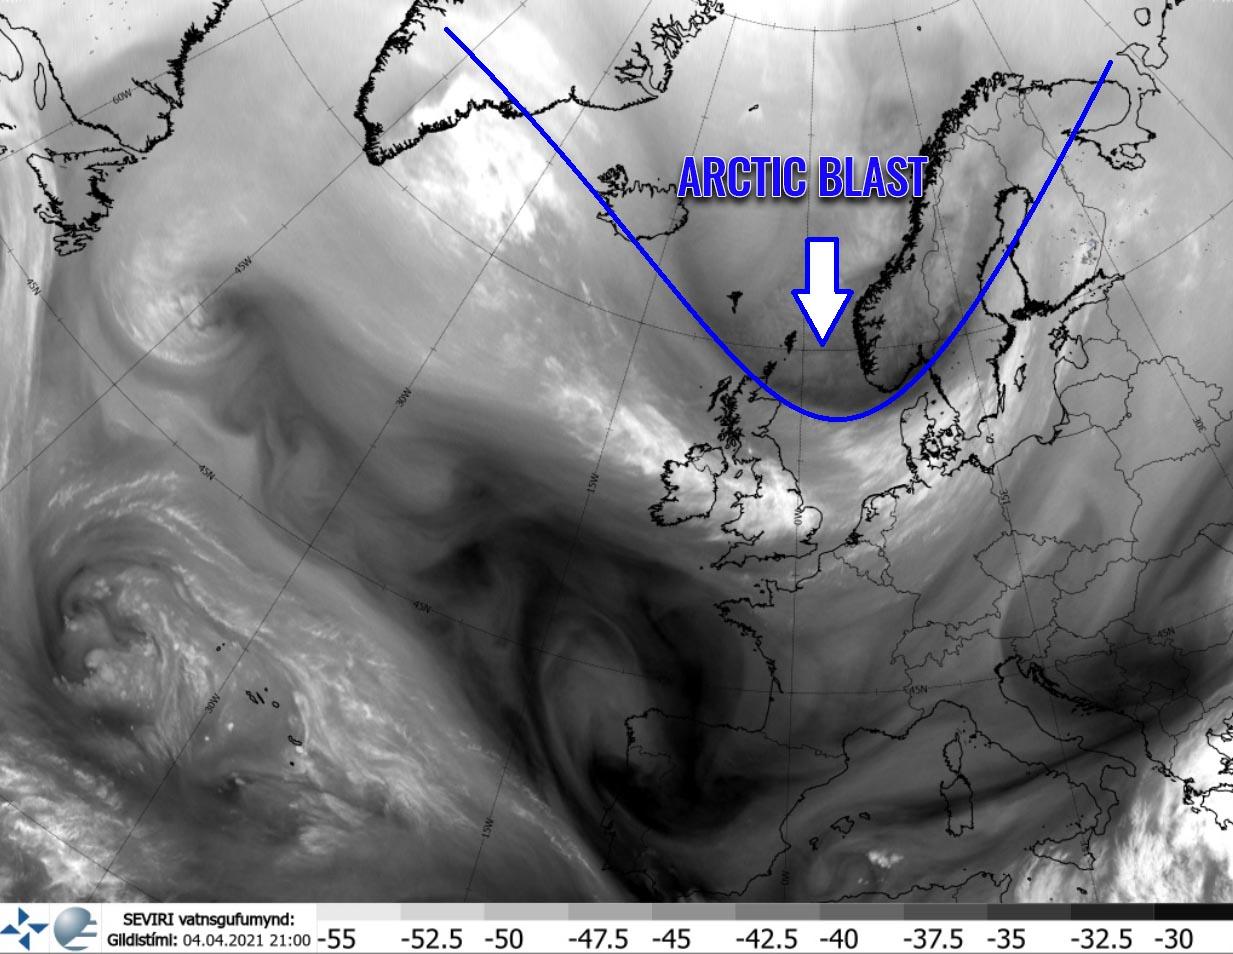 arctic-cold-blast-frost-snow-satellite-image